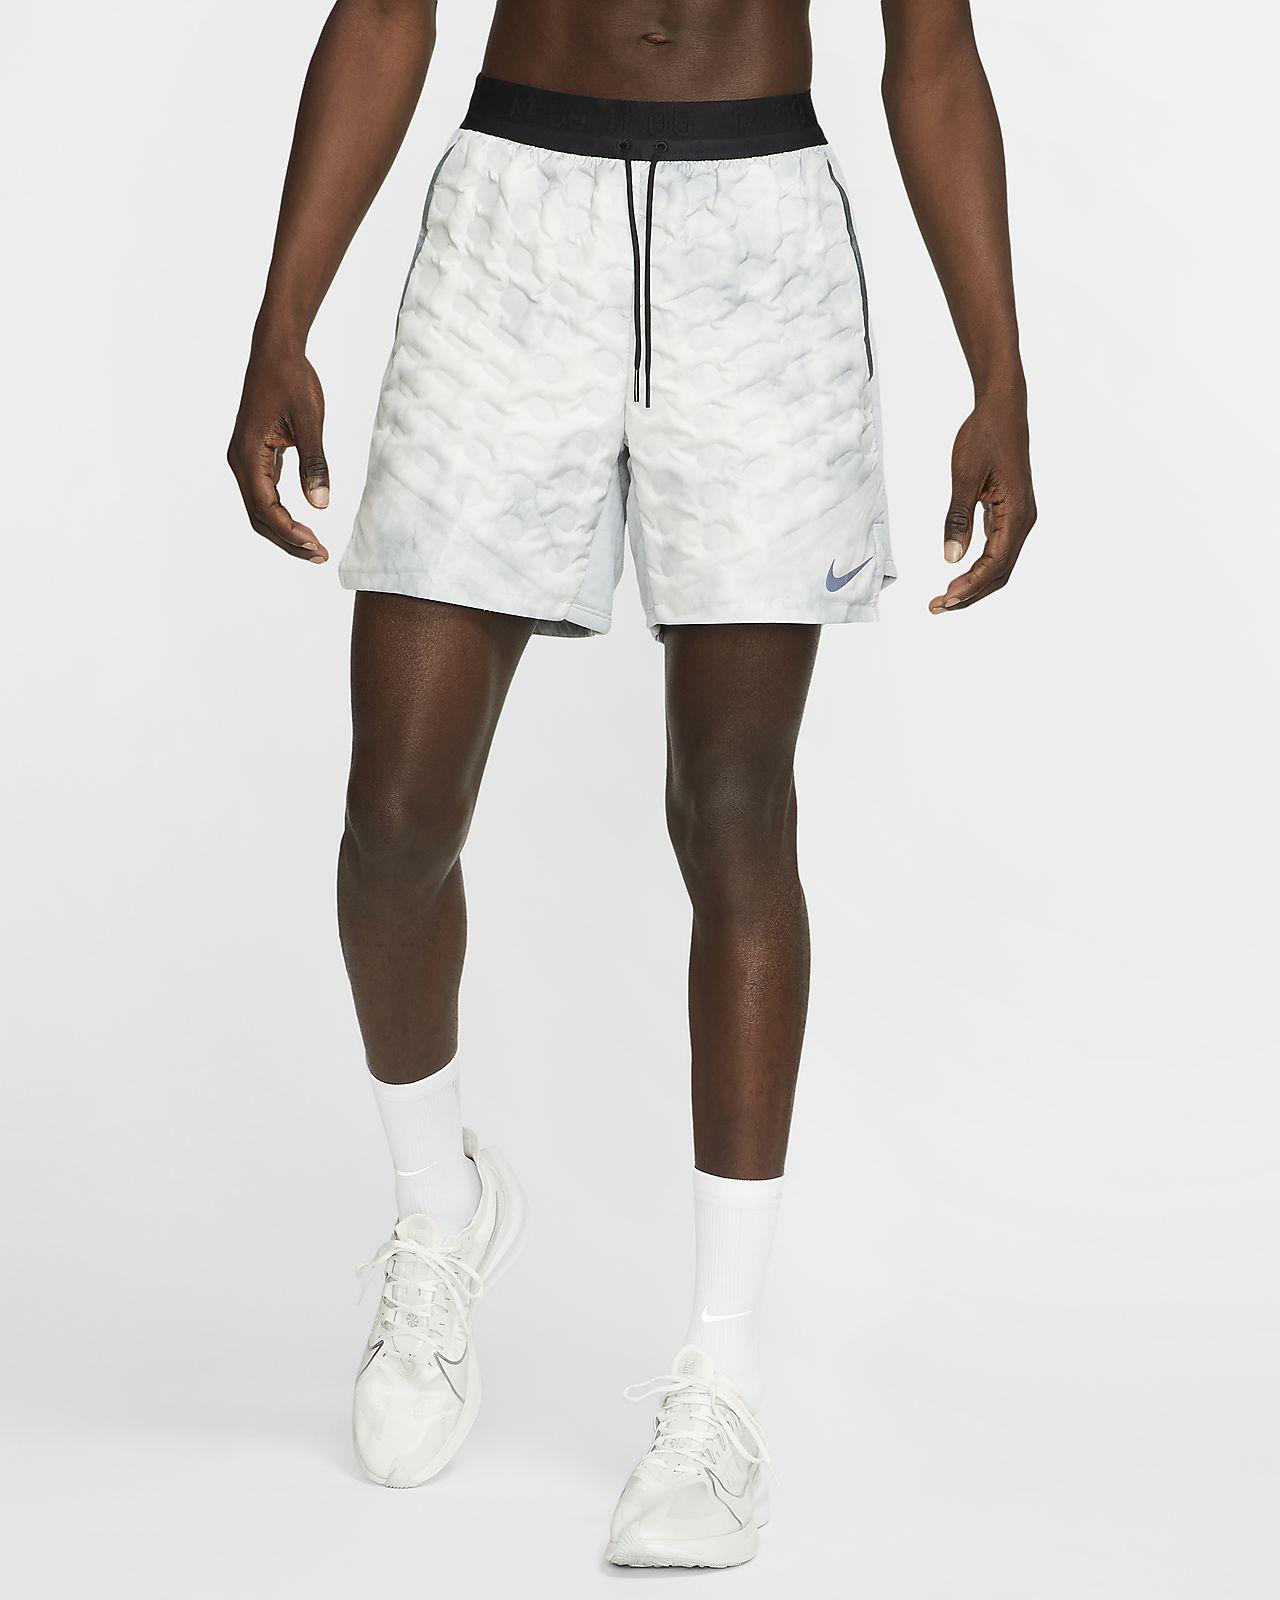 Nike AeroLoft Men's Running Shorts